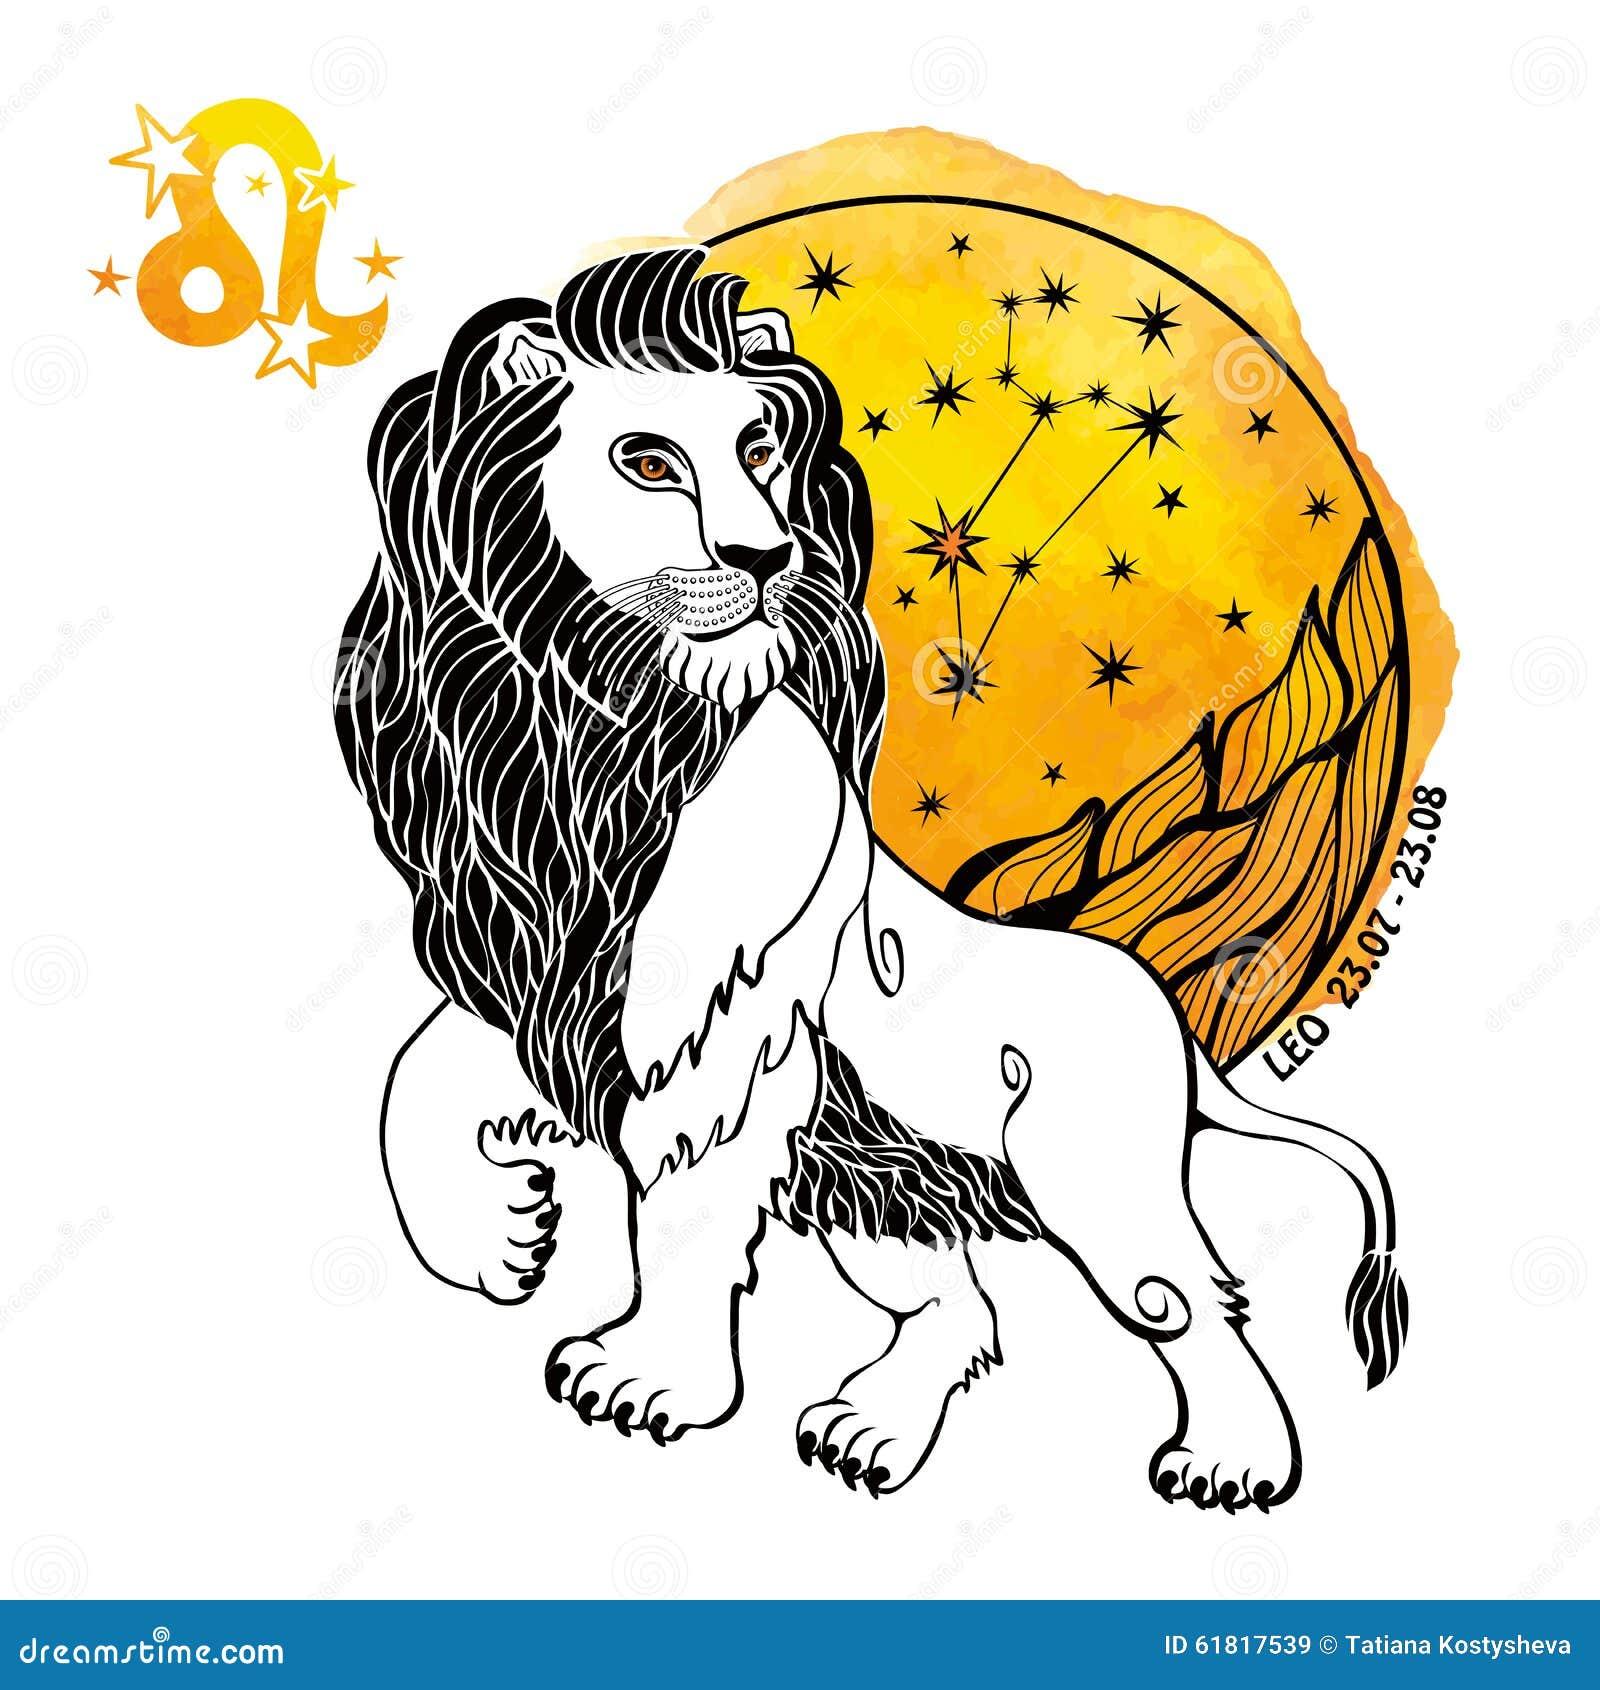 leo zodiac sign horoscope circle watercolor splash stock vector